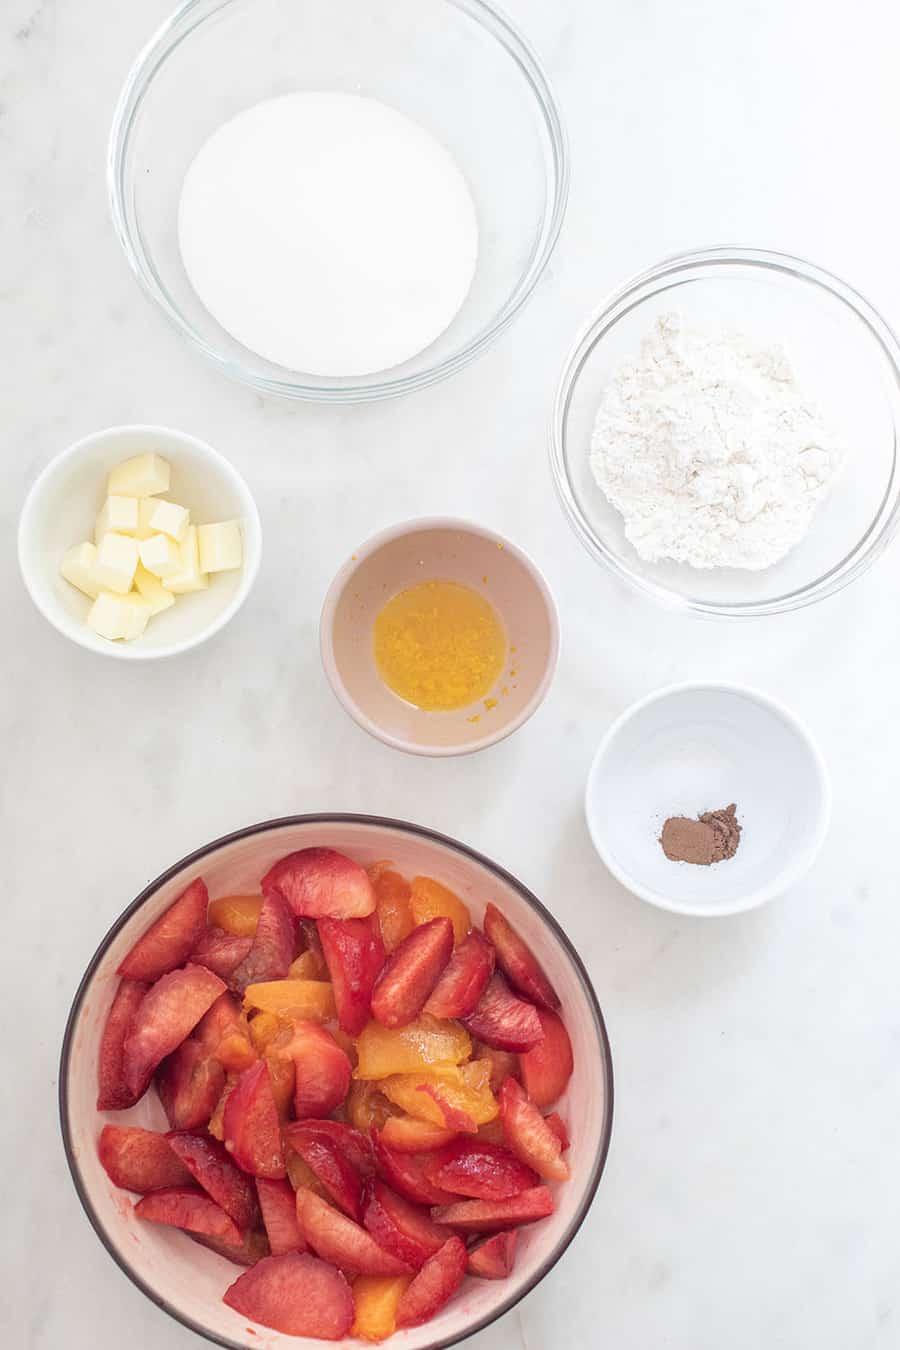 sugar, butter, orange, flour, slices and sliced fruit in a bowl.